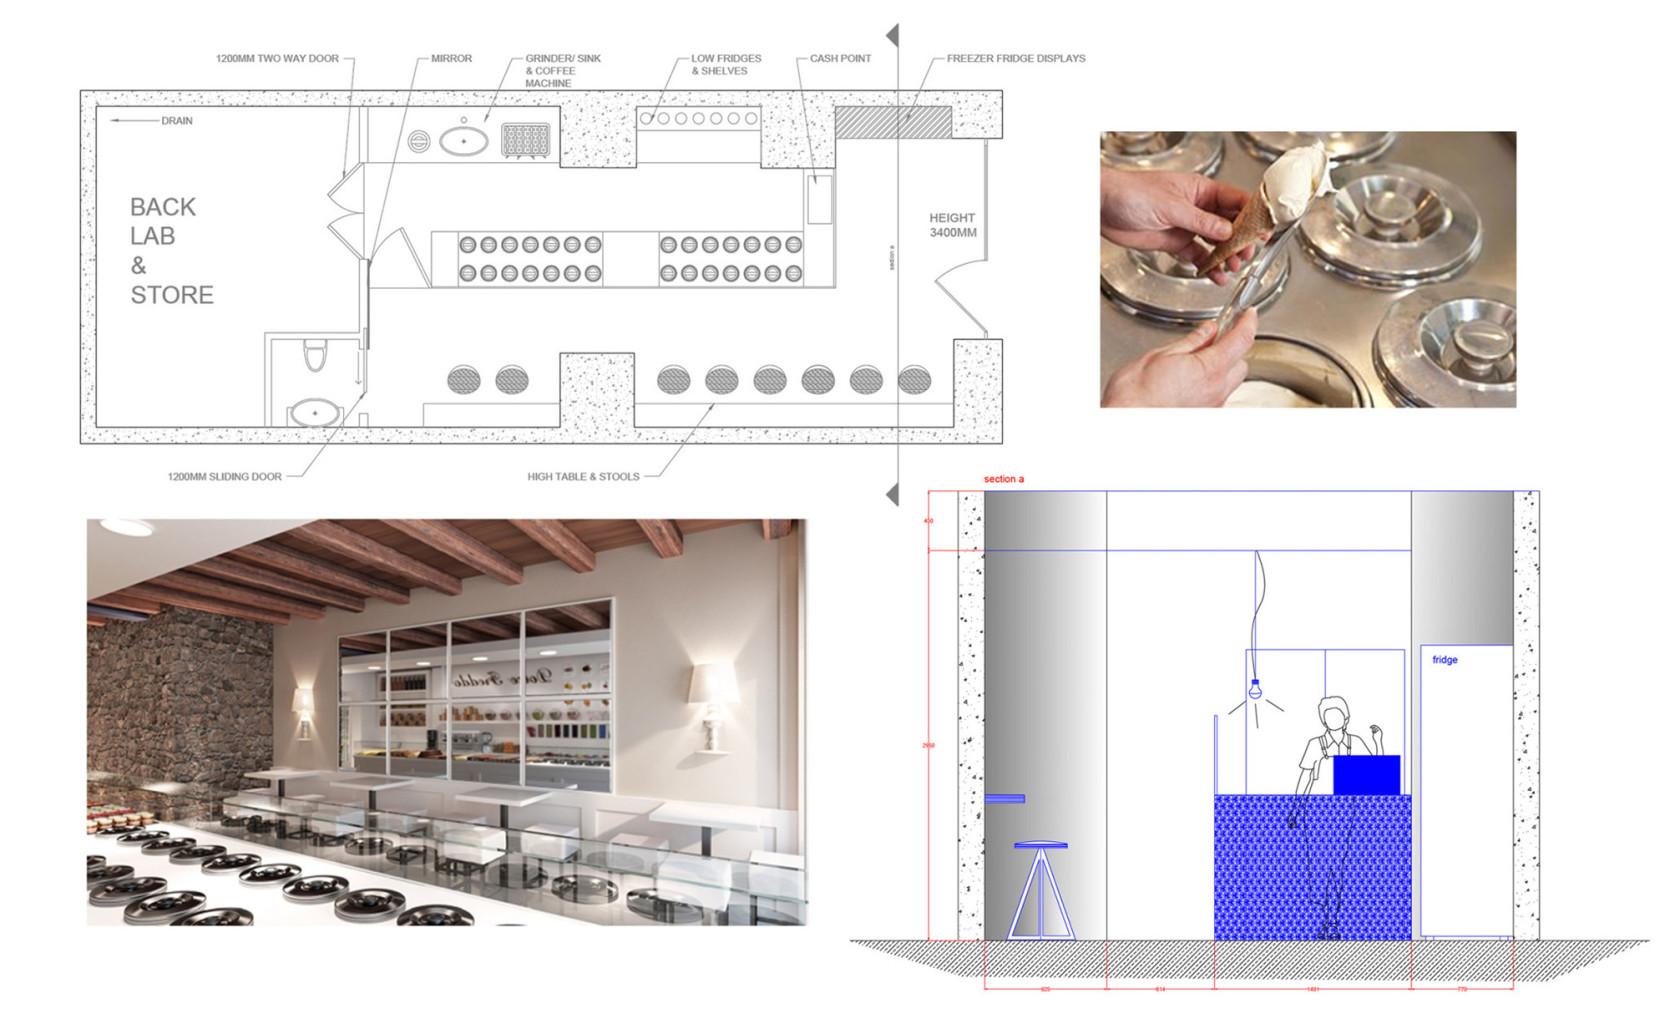 gelateria-presentation-2_page_02-copia